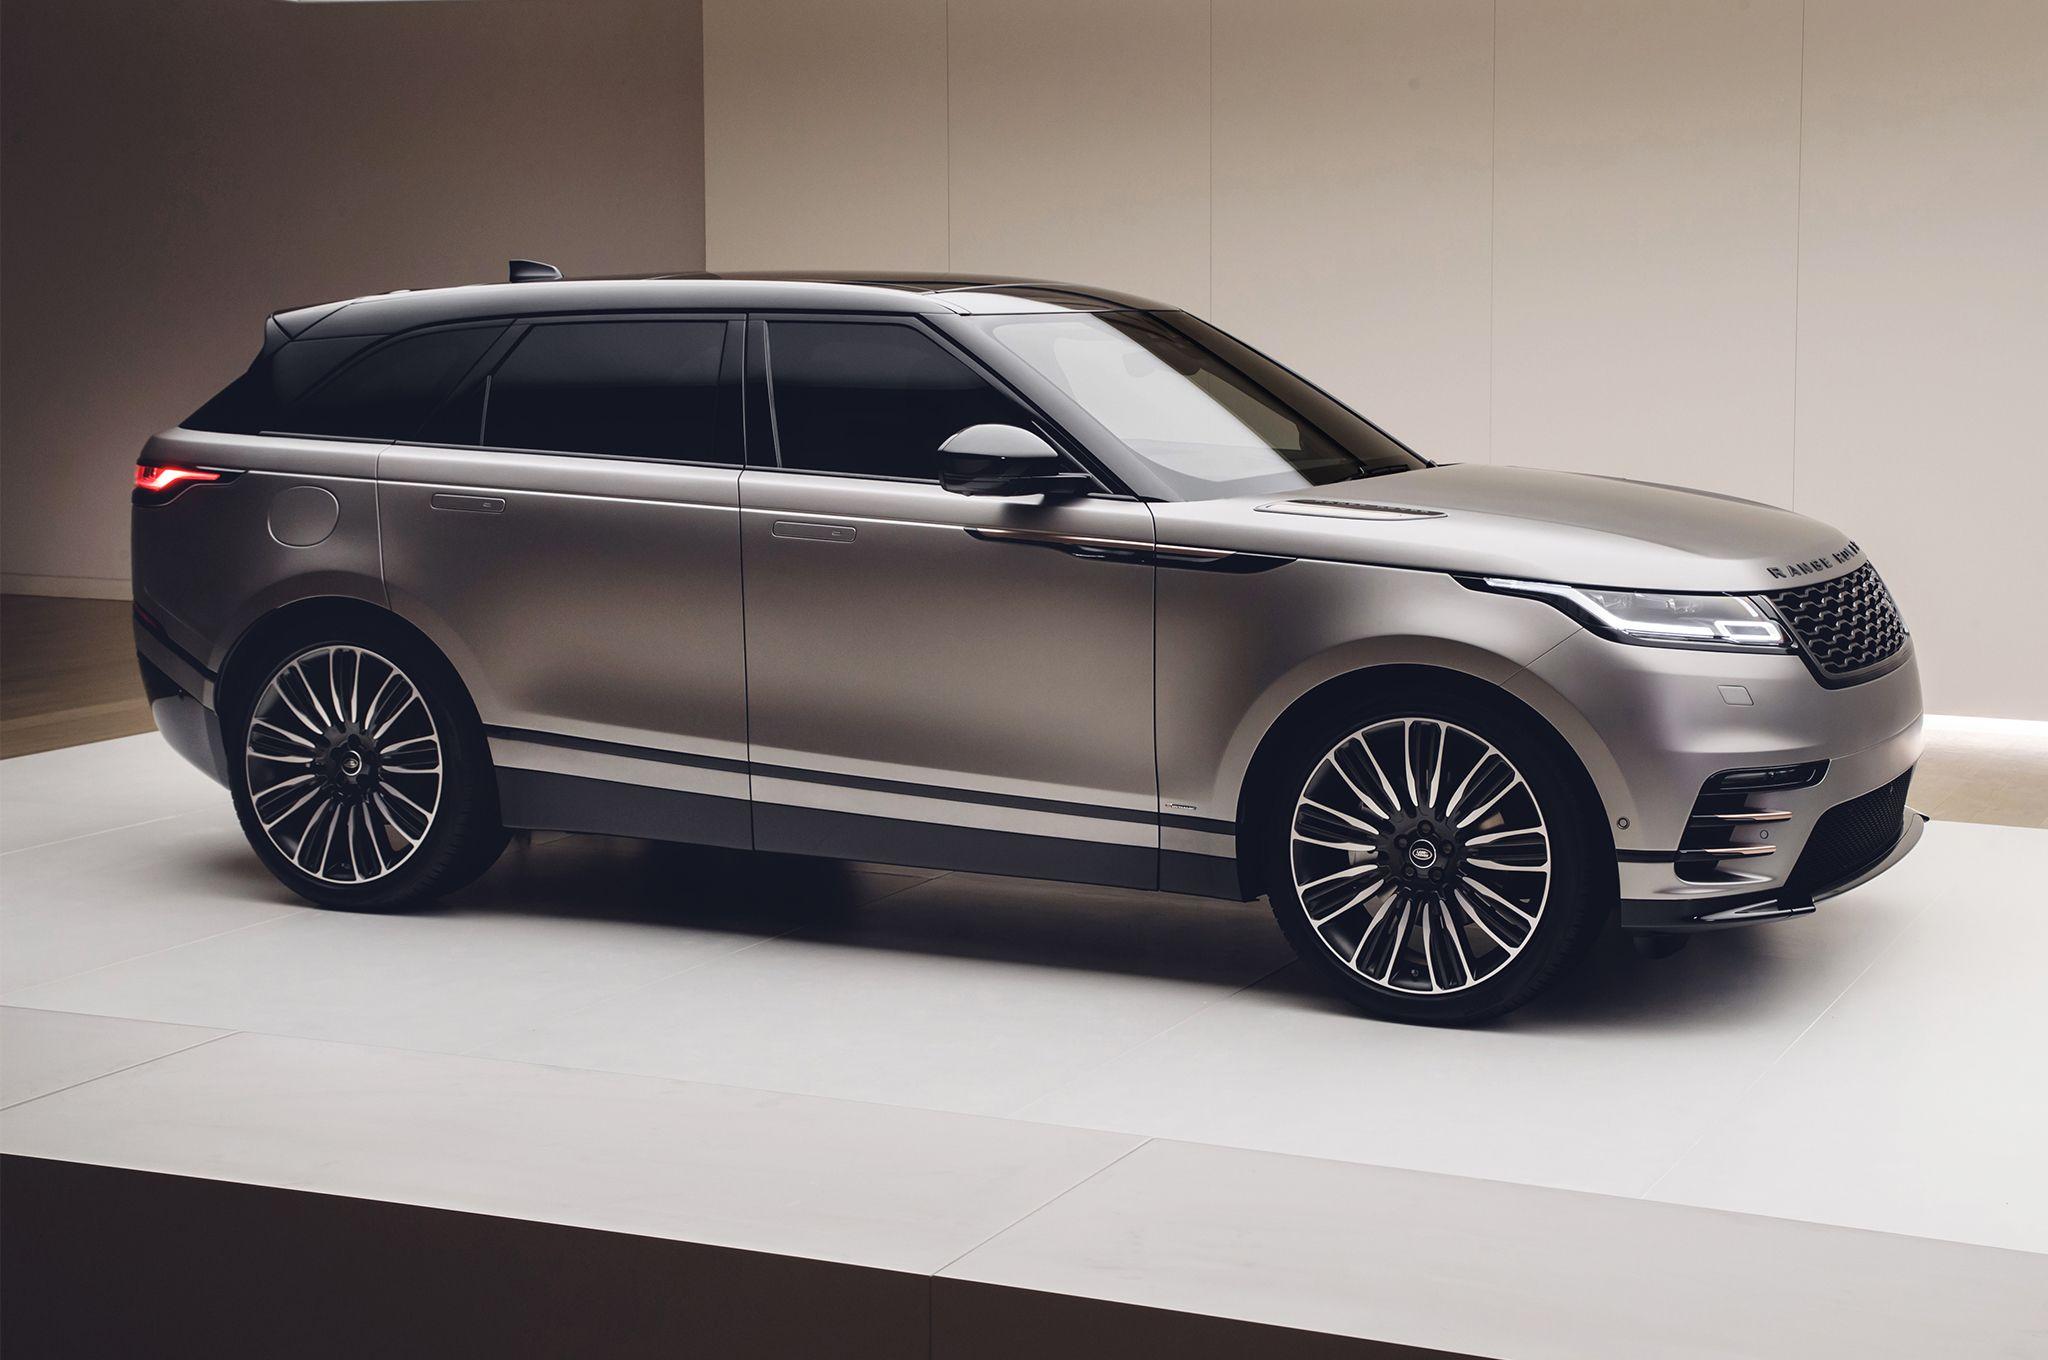 2018LandRoverRangeRoverVelarfrontside Luxury cars